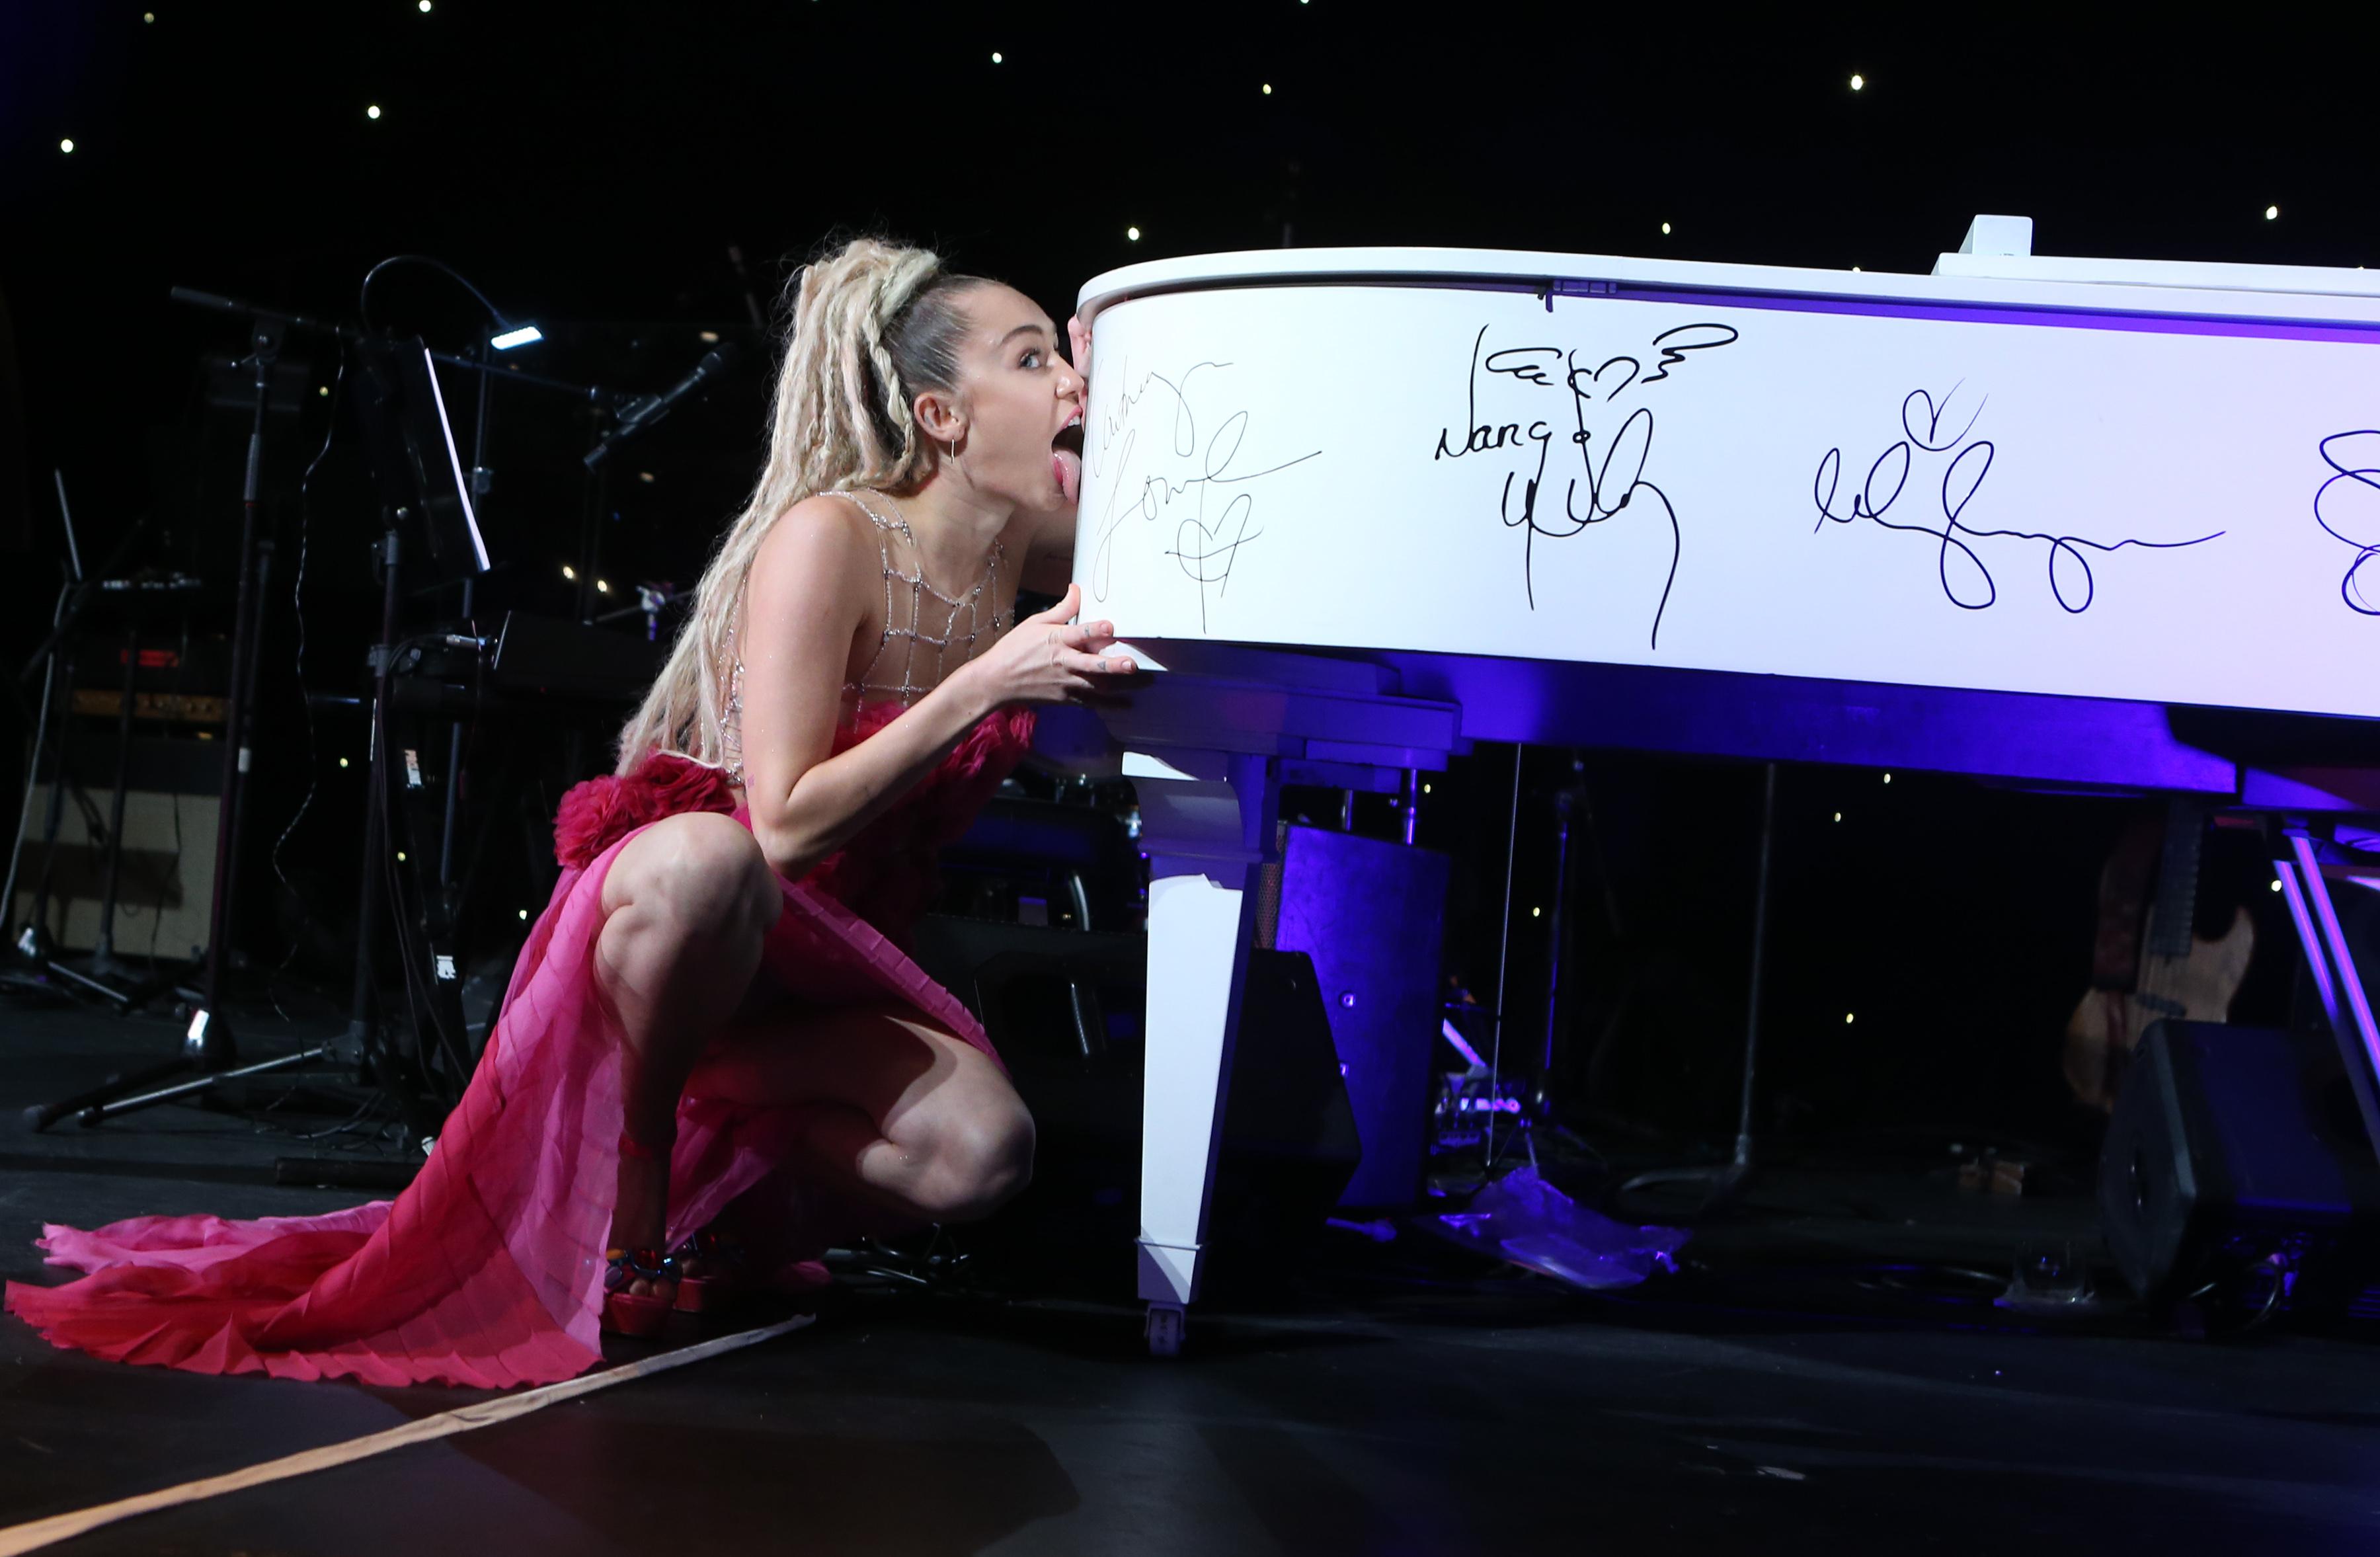 Miley Cyrus hot boobs